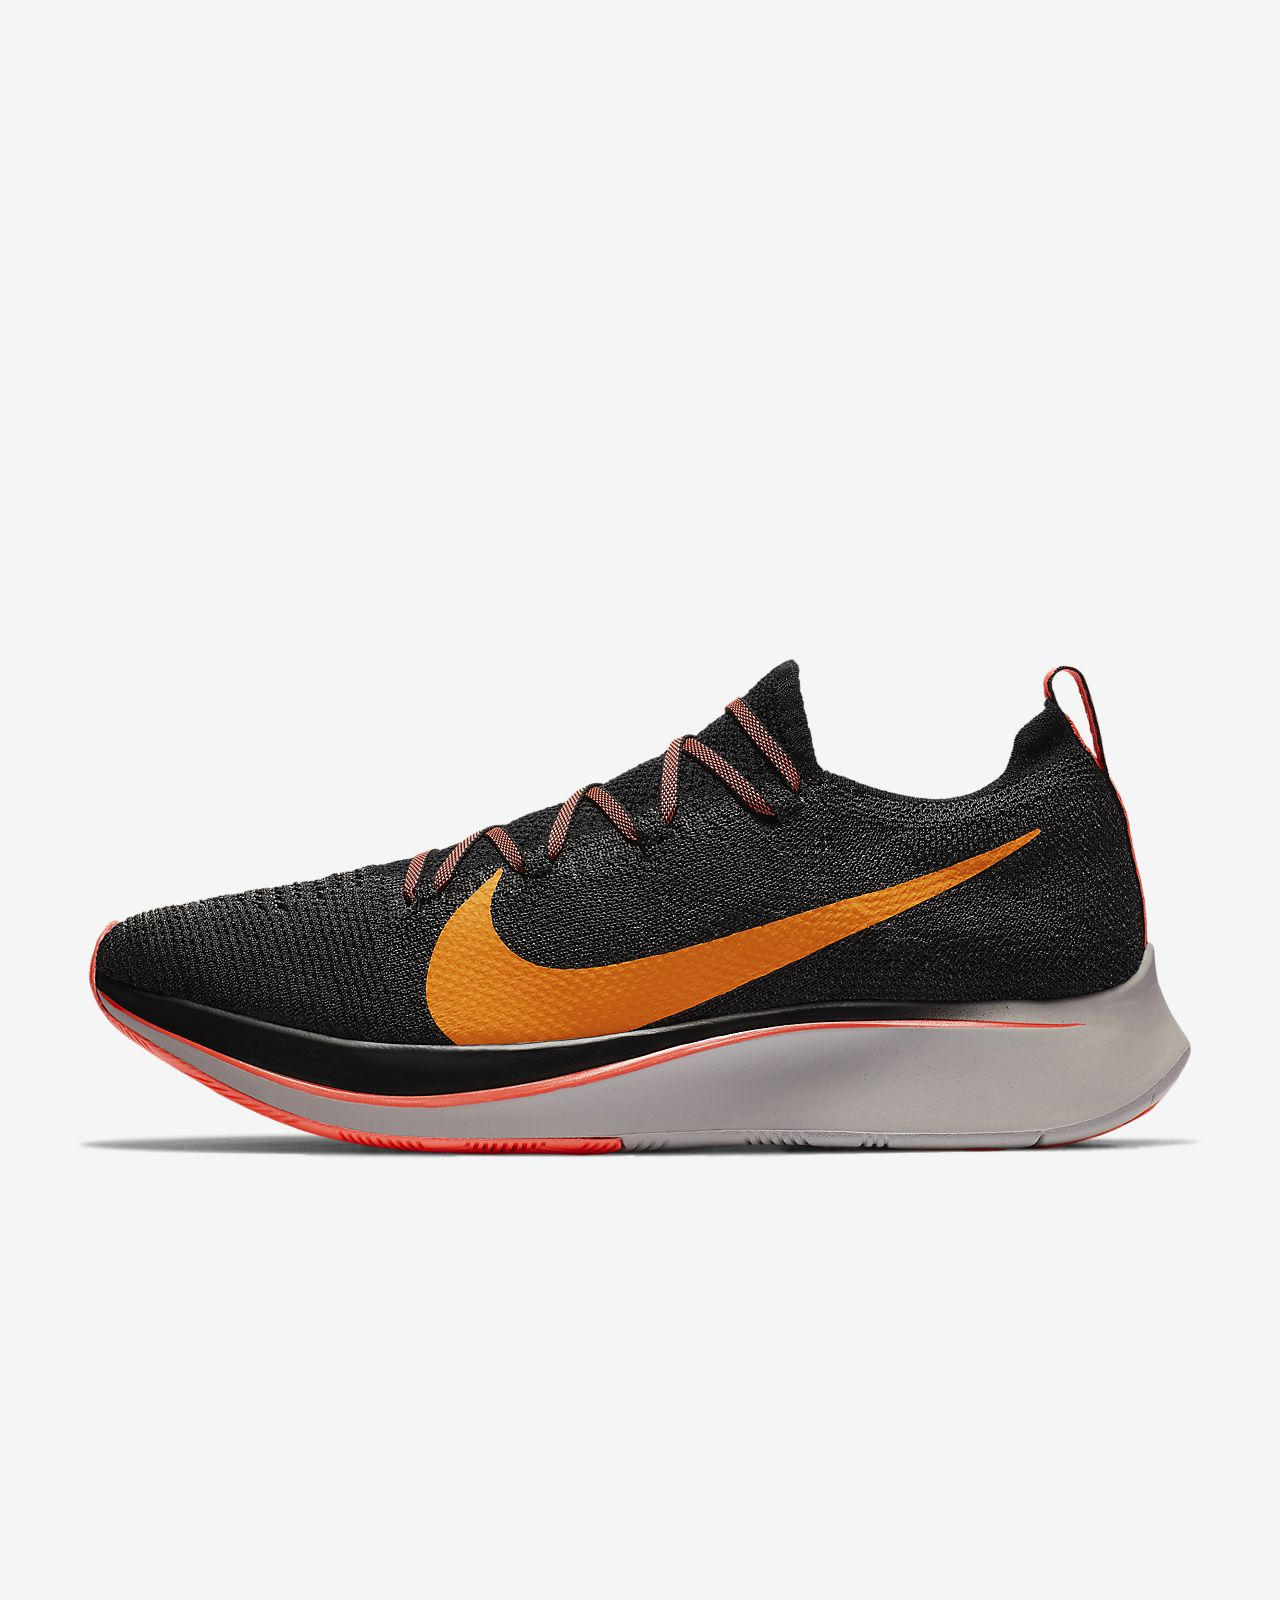 Nike Zoom Fly Flyknit Zapatillas de running - Hombre. Nike.com ES 48fcb544b7f